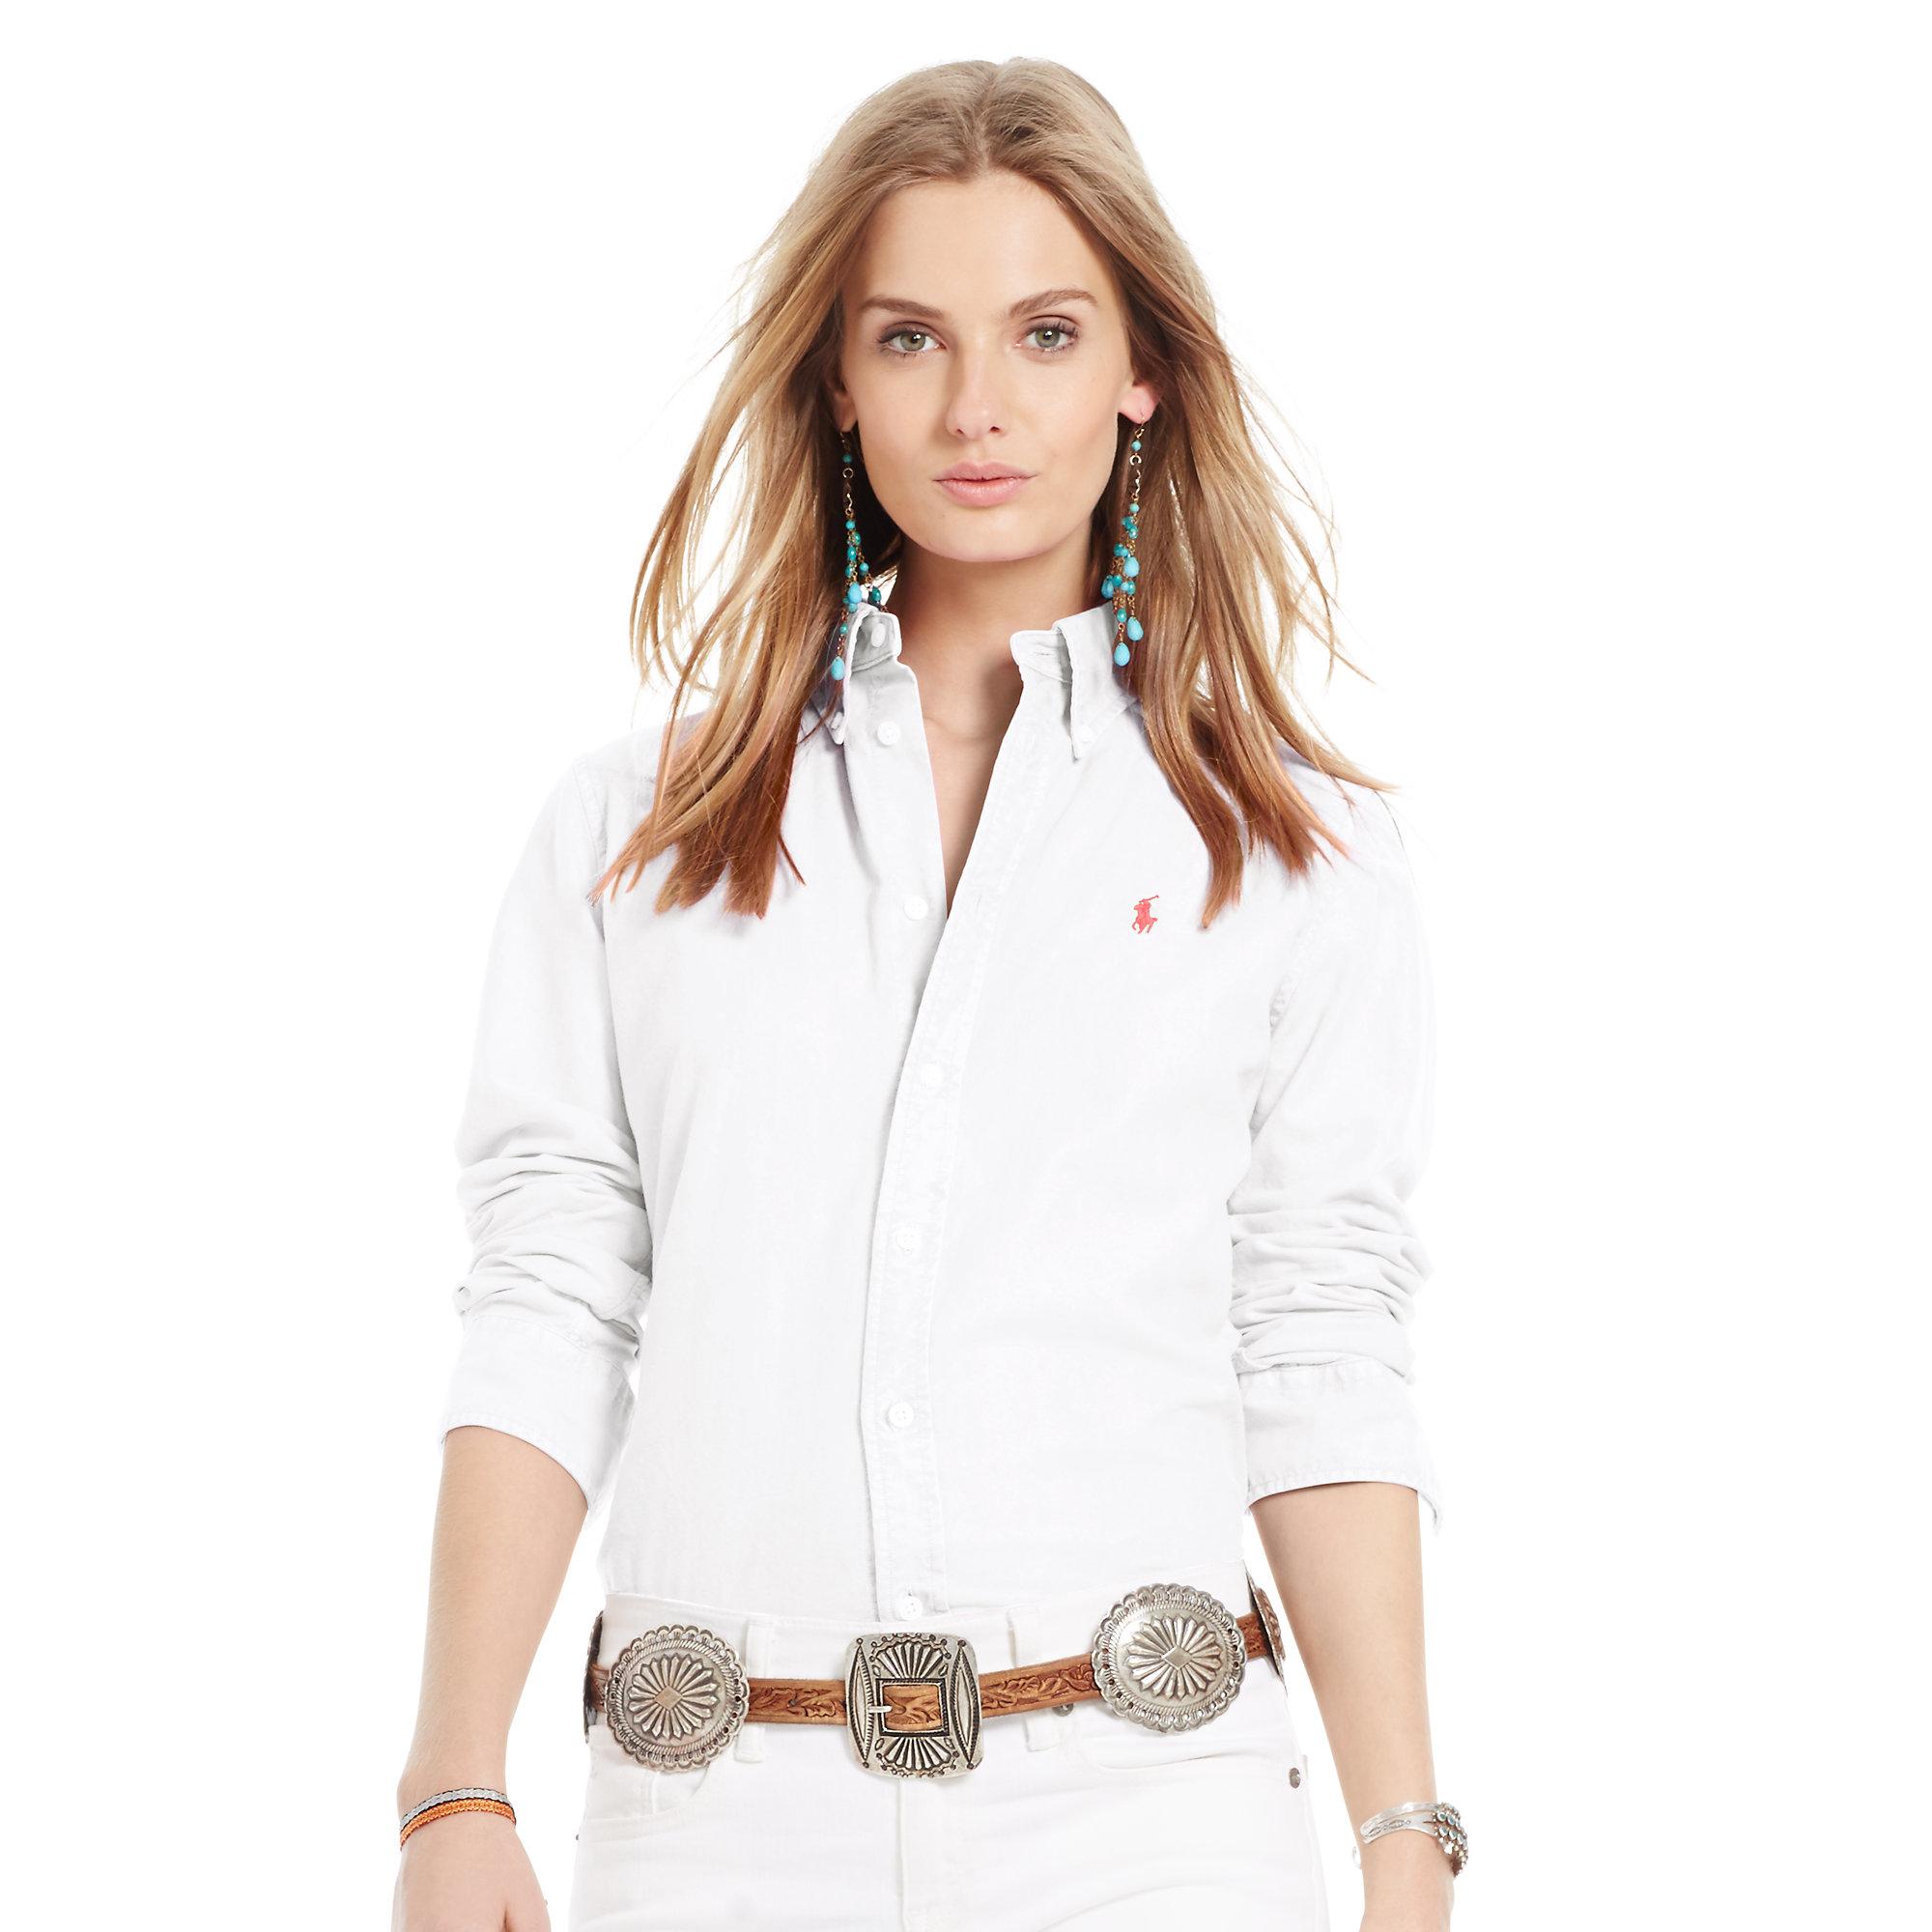 815b83d7f Ralph Lauren Womens Oxford Shirt White - DREAMWORKS